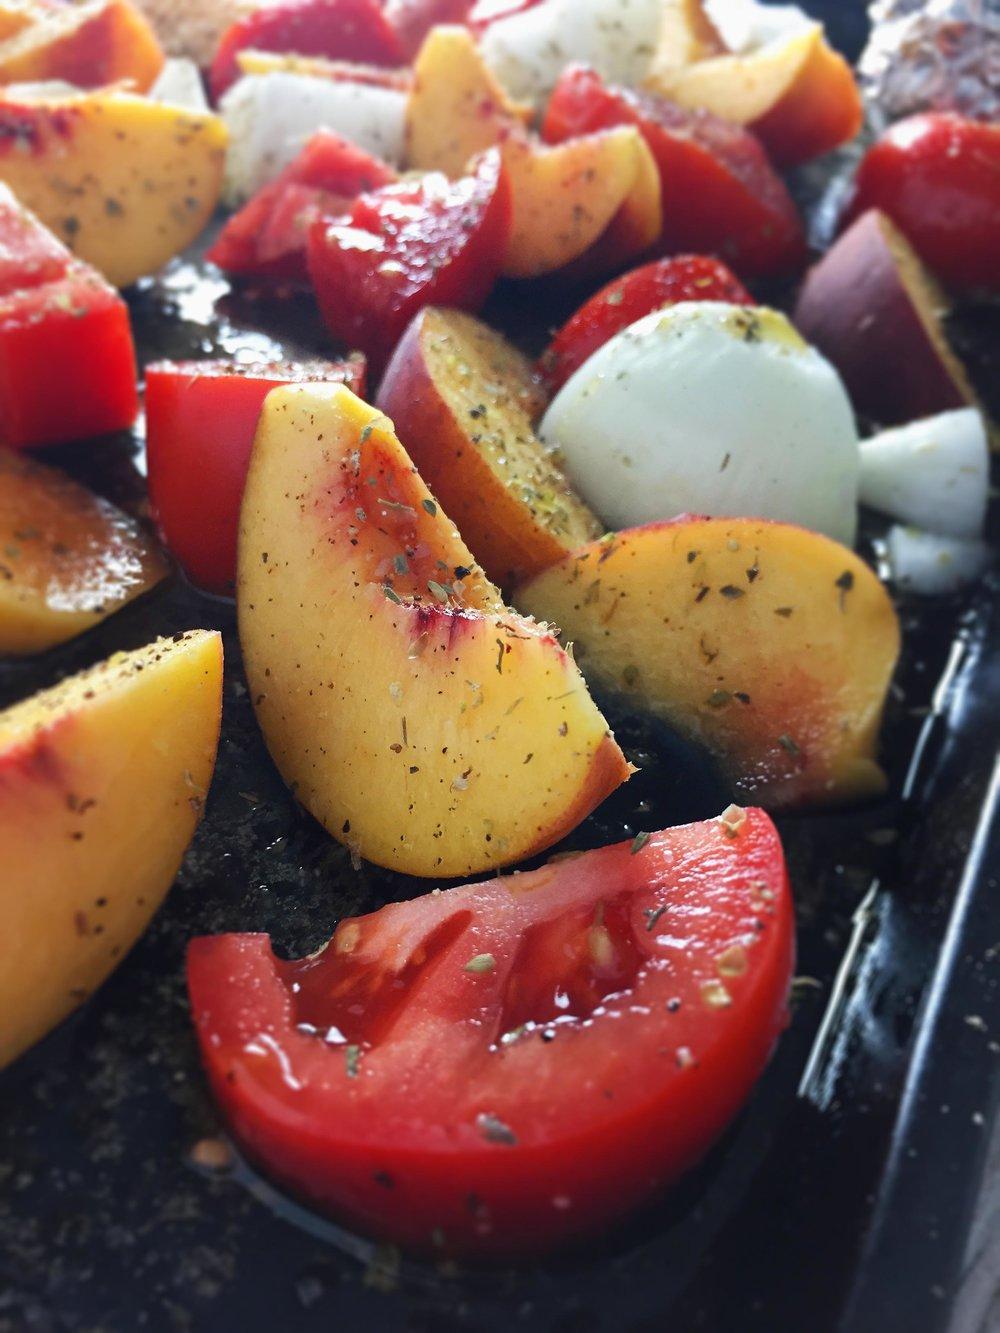 spiced-pork-tenderloin-w-tomato-peach-sauce13.jpg